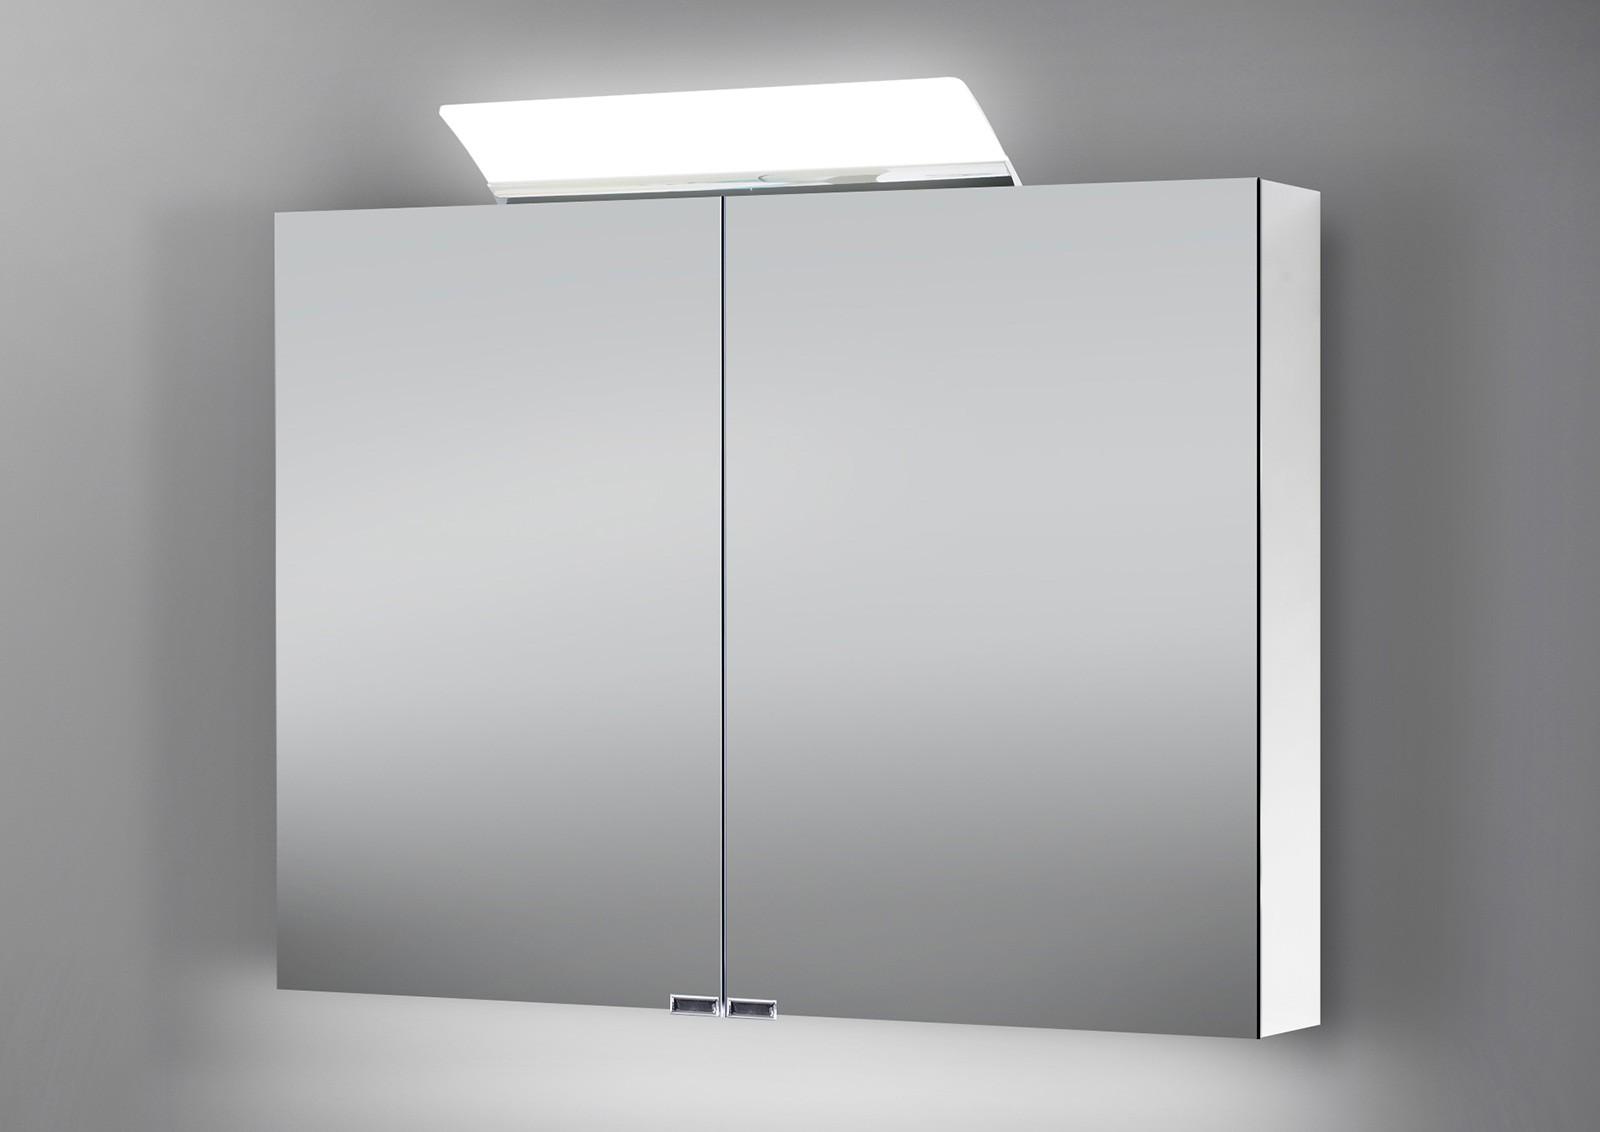 Spiegelschrank bad 100 cm led beleuchtung doppelseitig verspiegelt - Spiegelschrank bad 100 cm ...